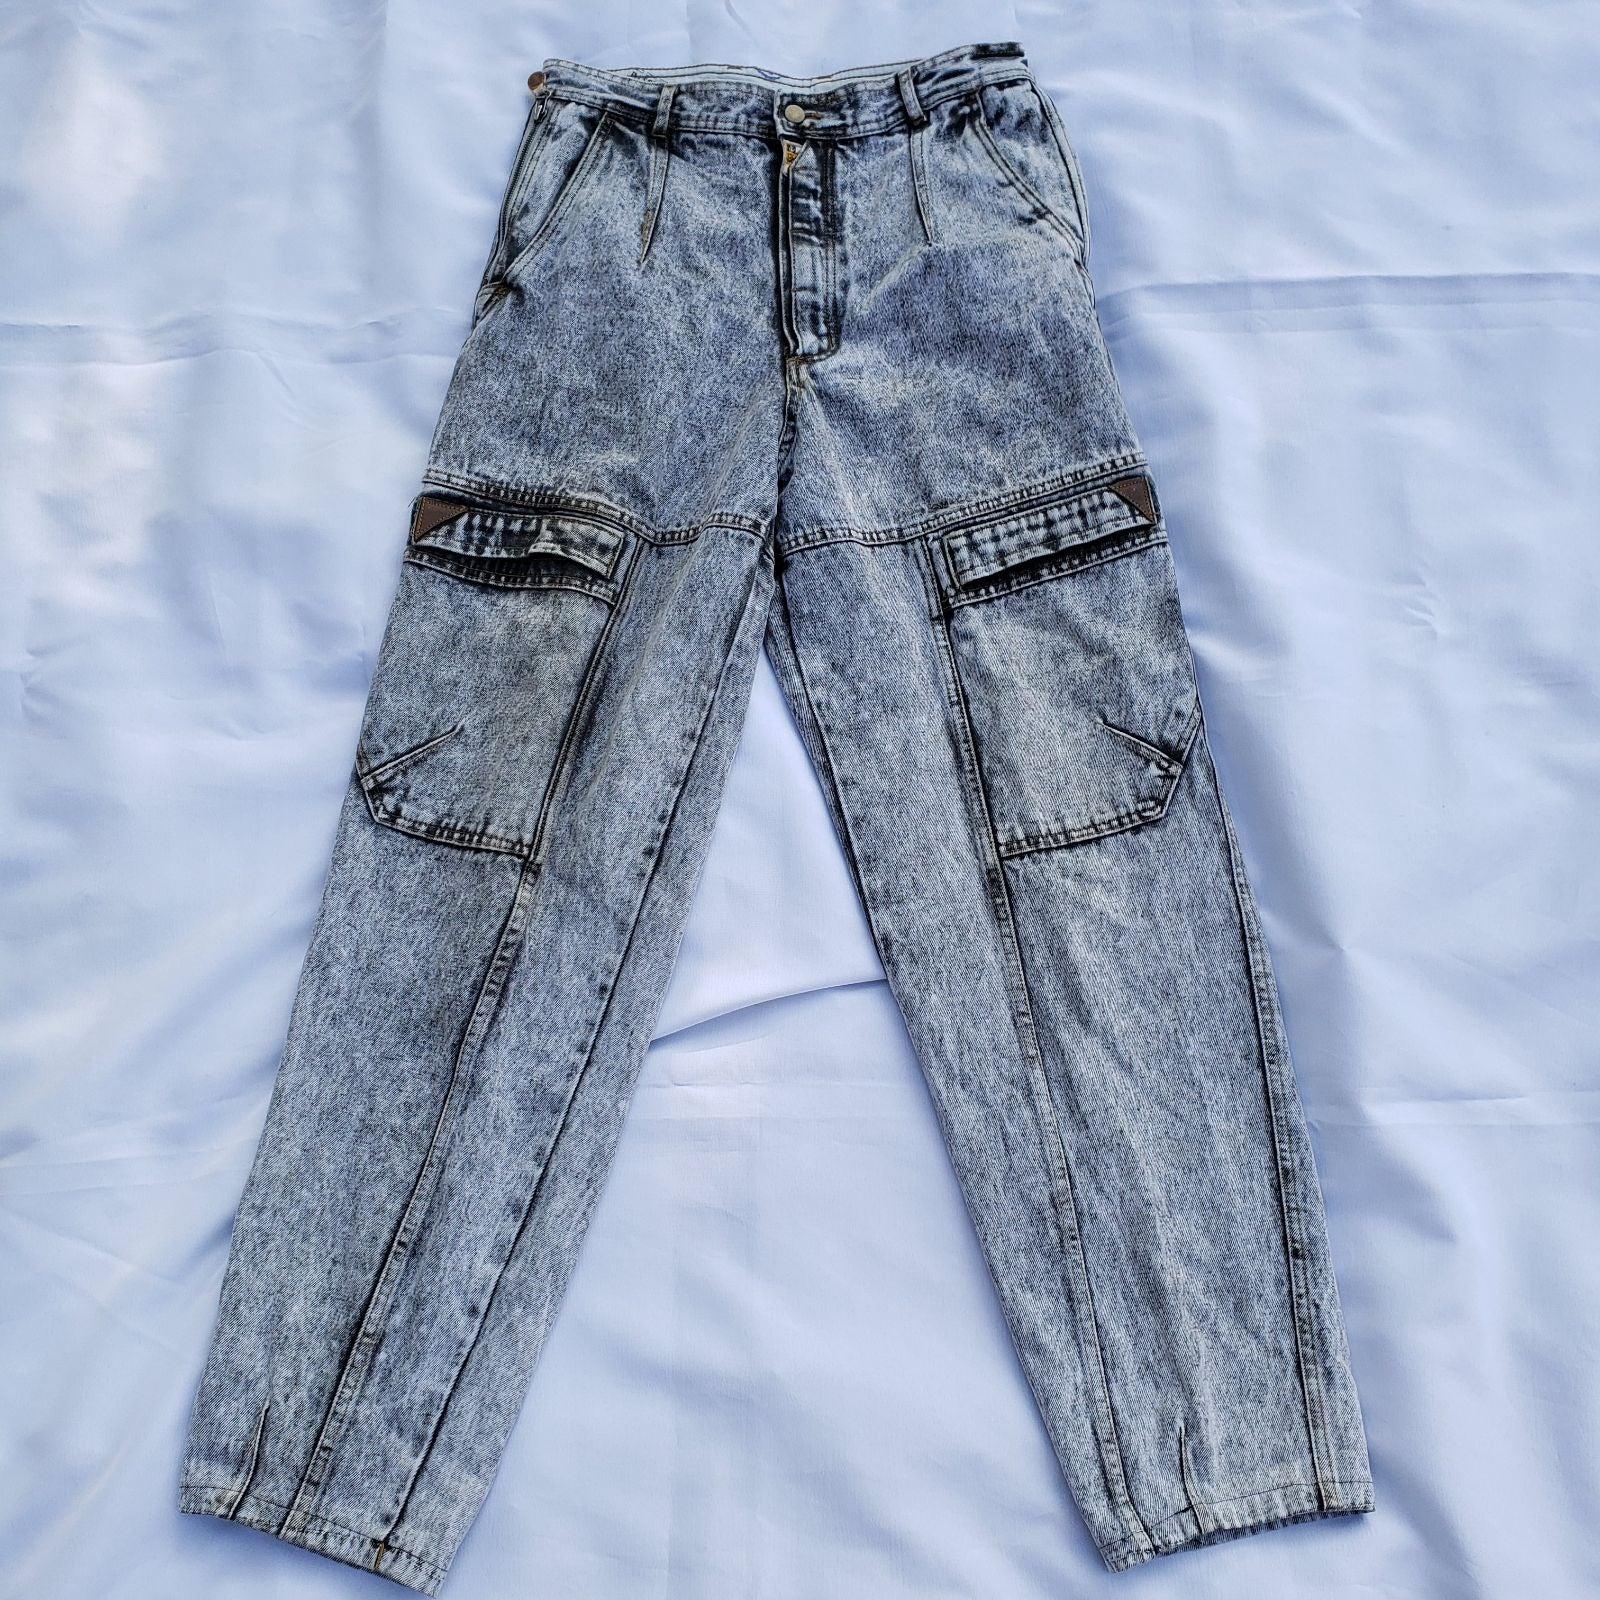 Bugle Boy Jeans Naval Issue Acid Wash